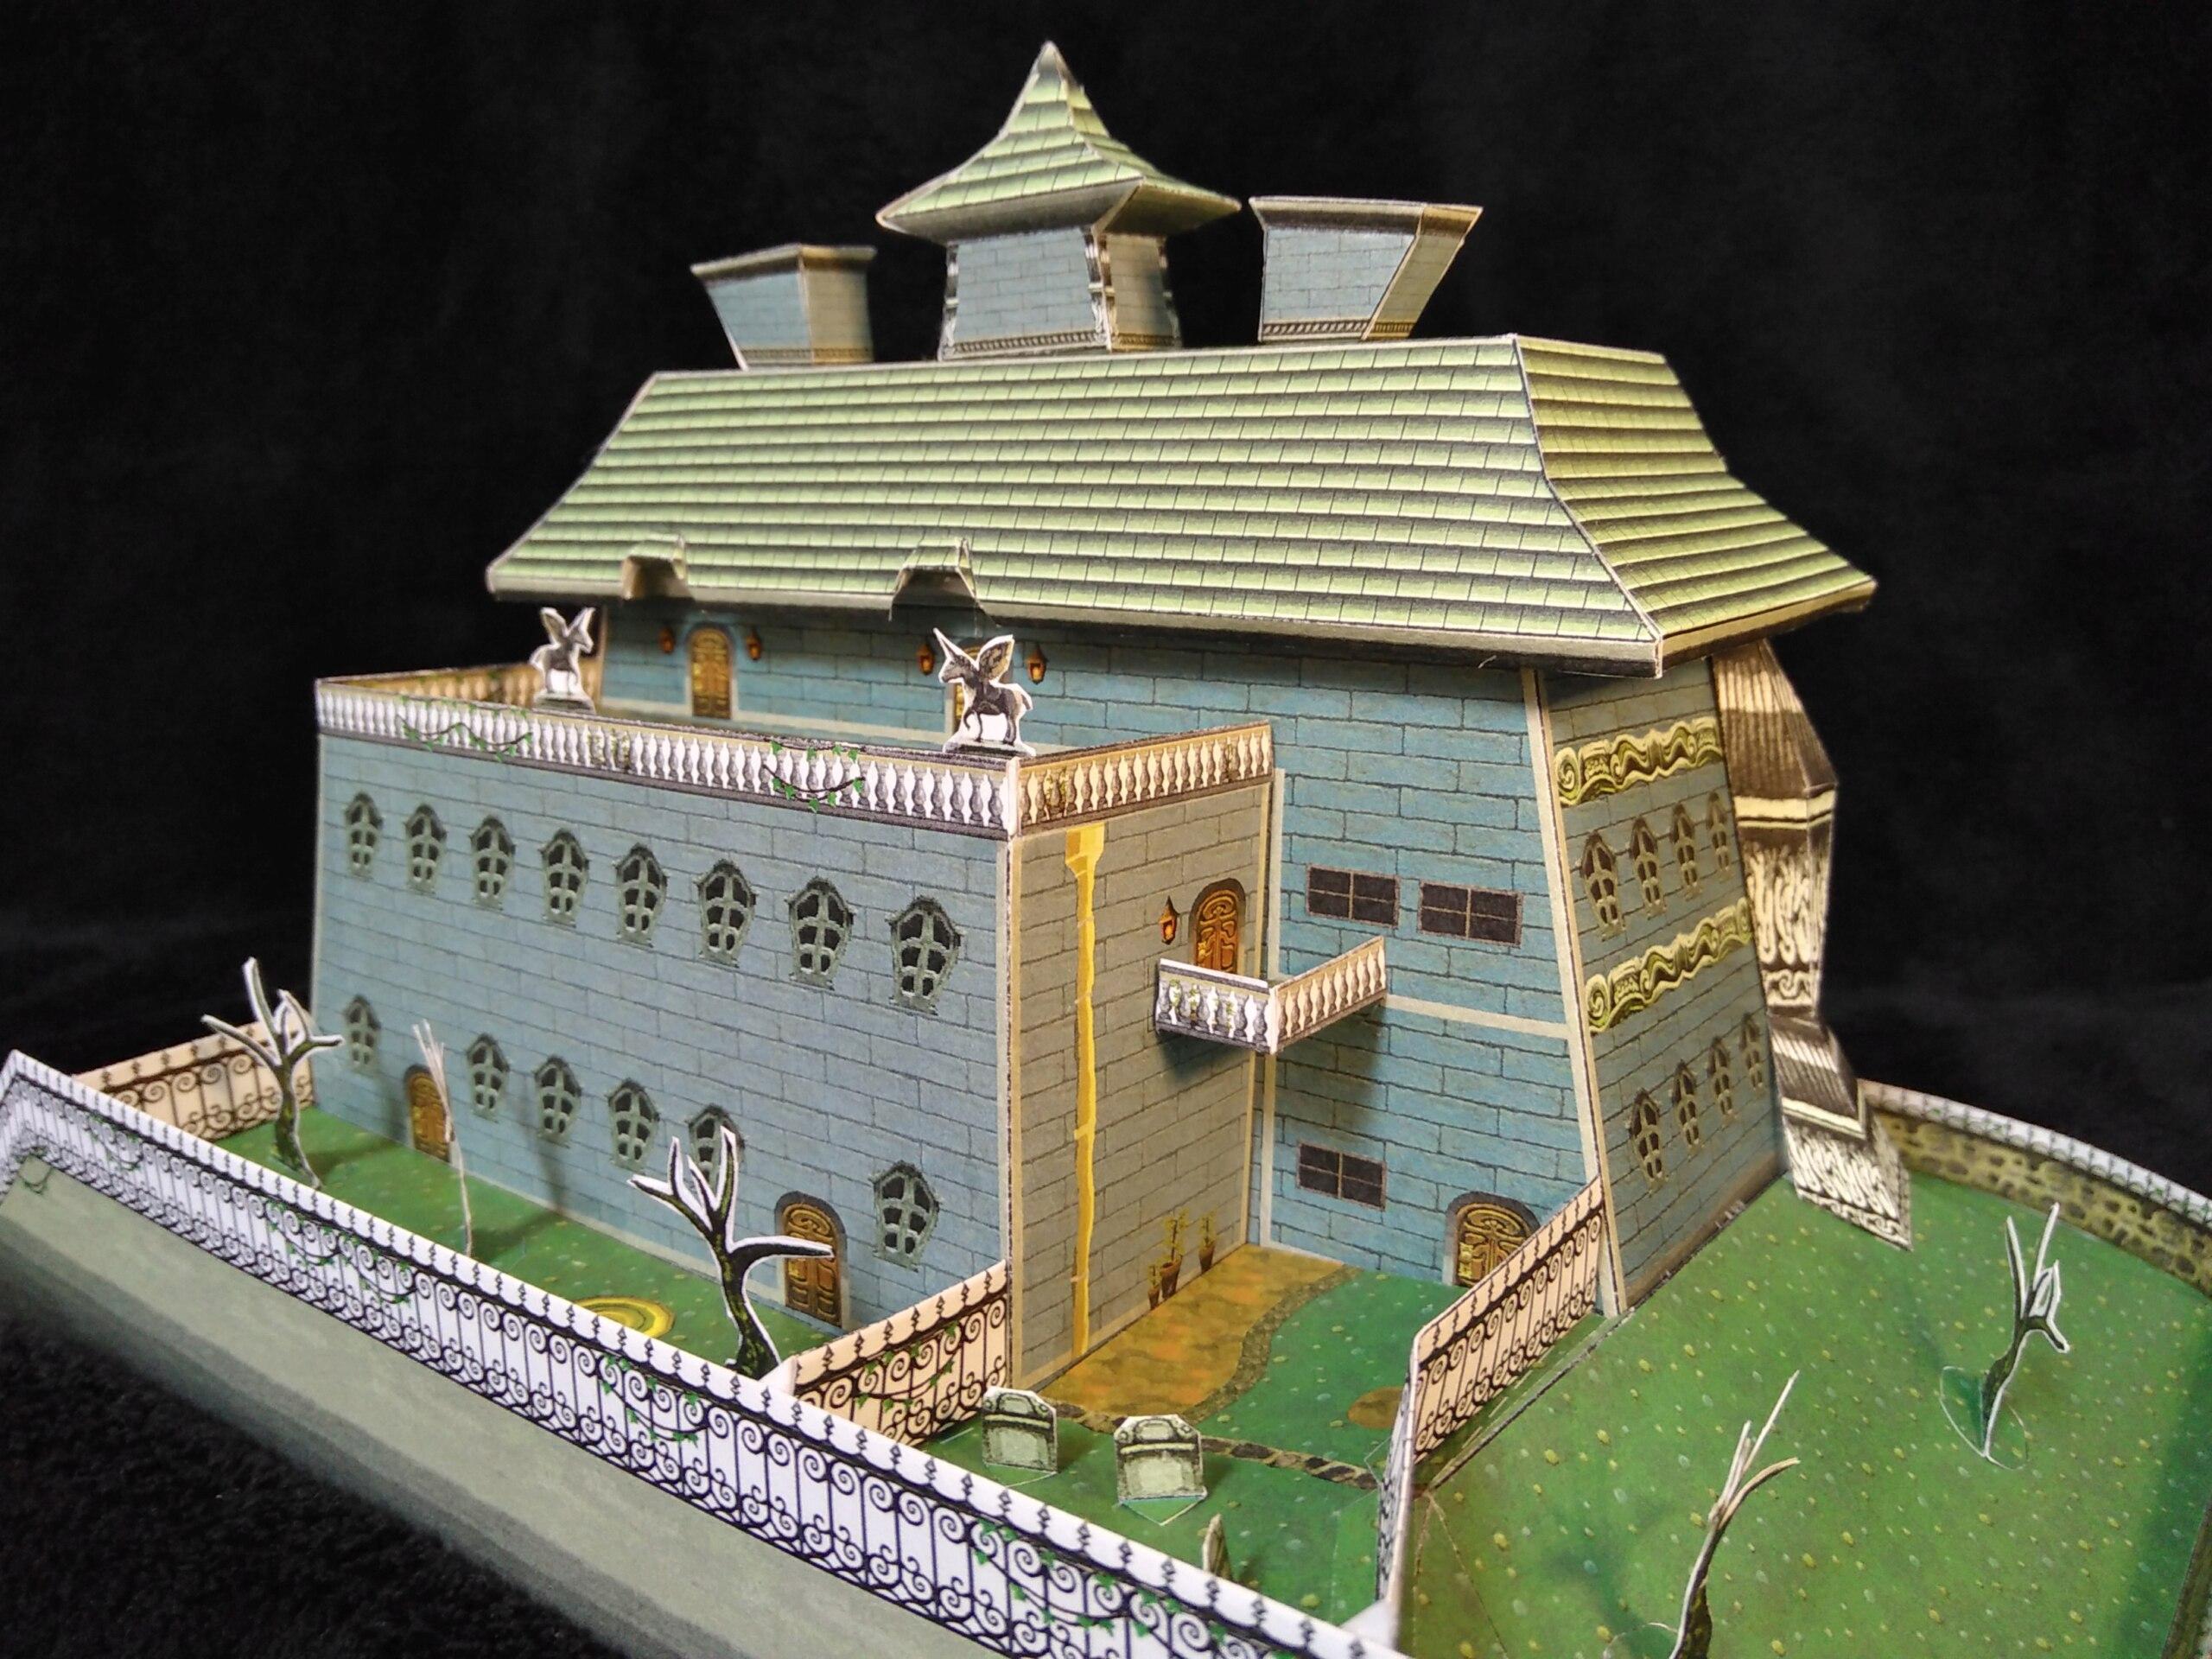 Luigi's Mansion - Die Gruselvilla aus dem Gamecube-Klassiker Img_2019